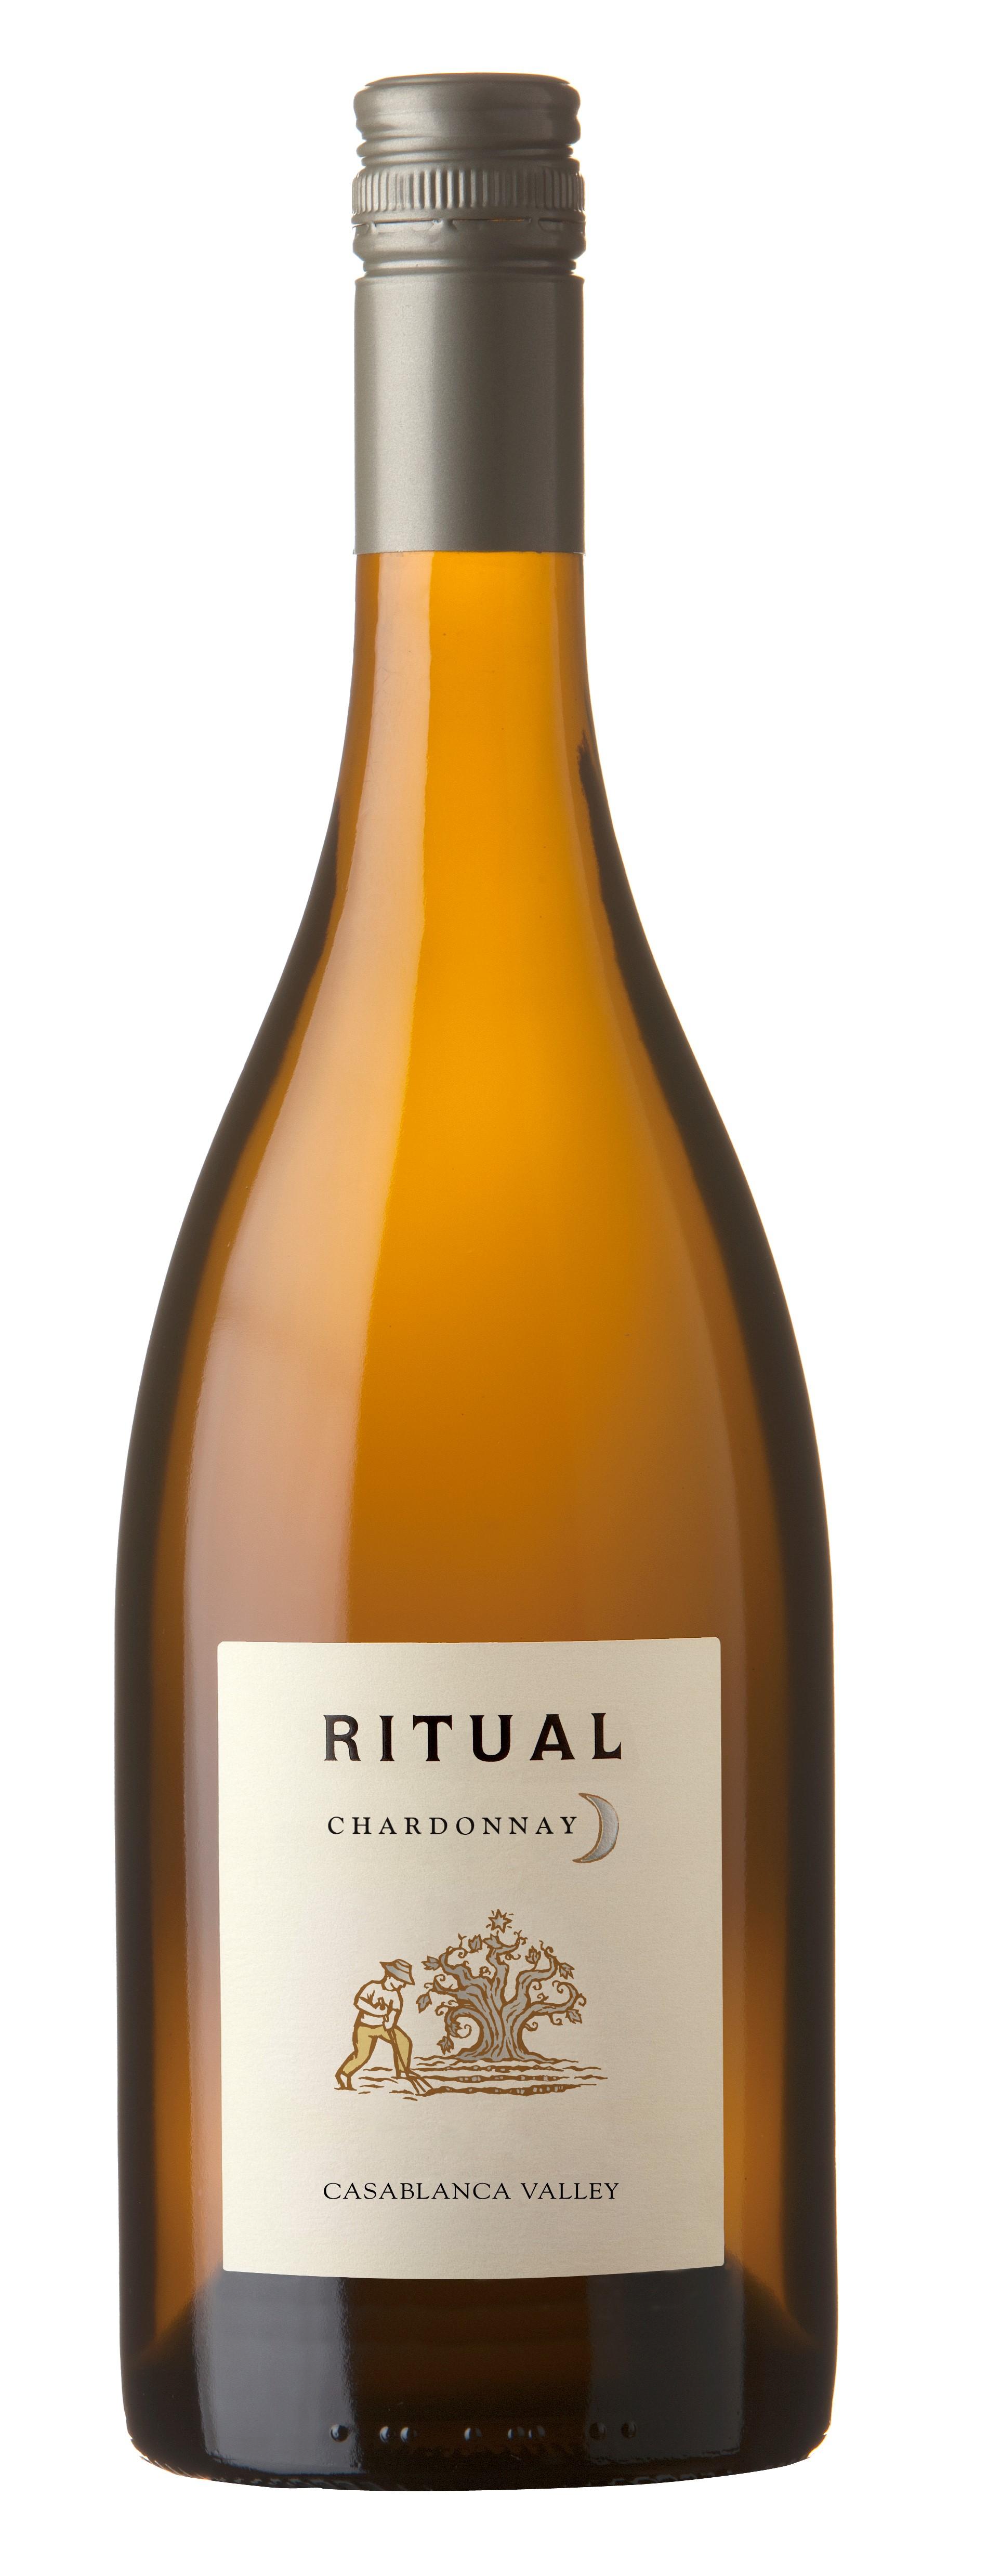 2015Ritual Chardonnay Casablanca Valley